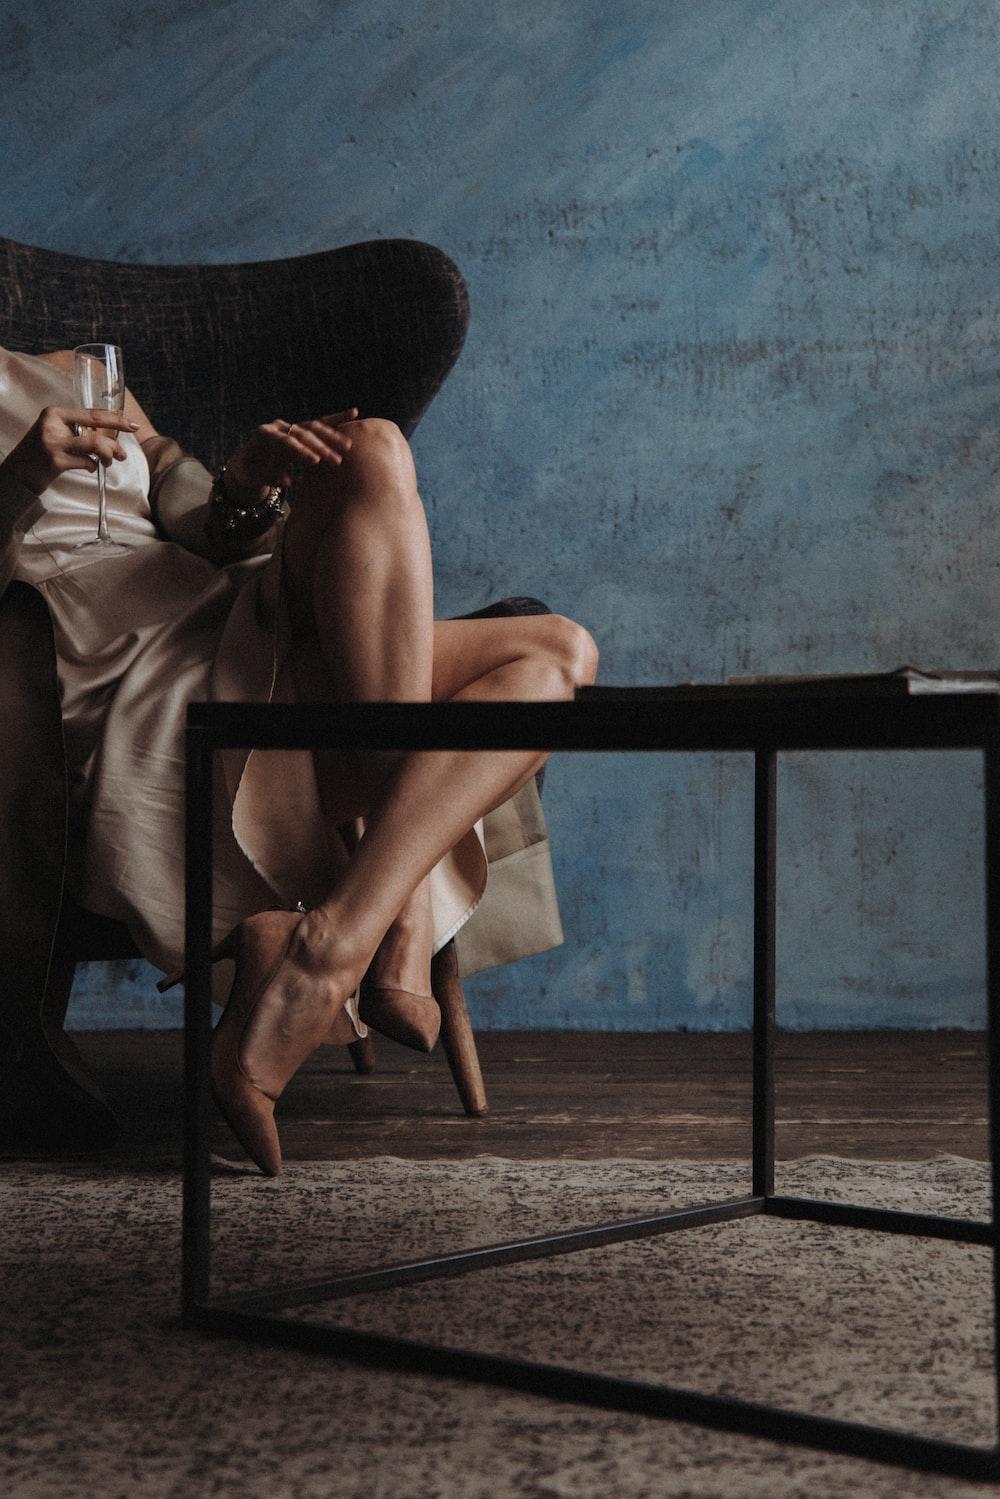 woman sitting on sofa chair